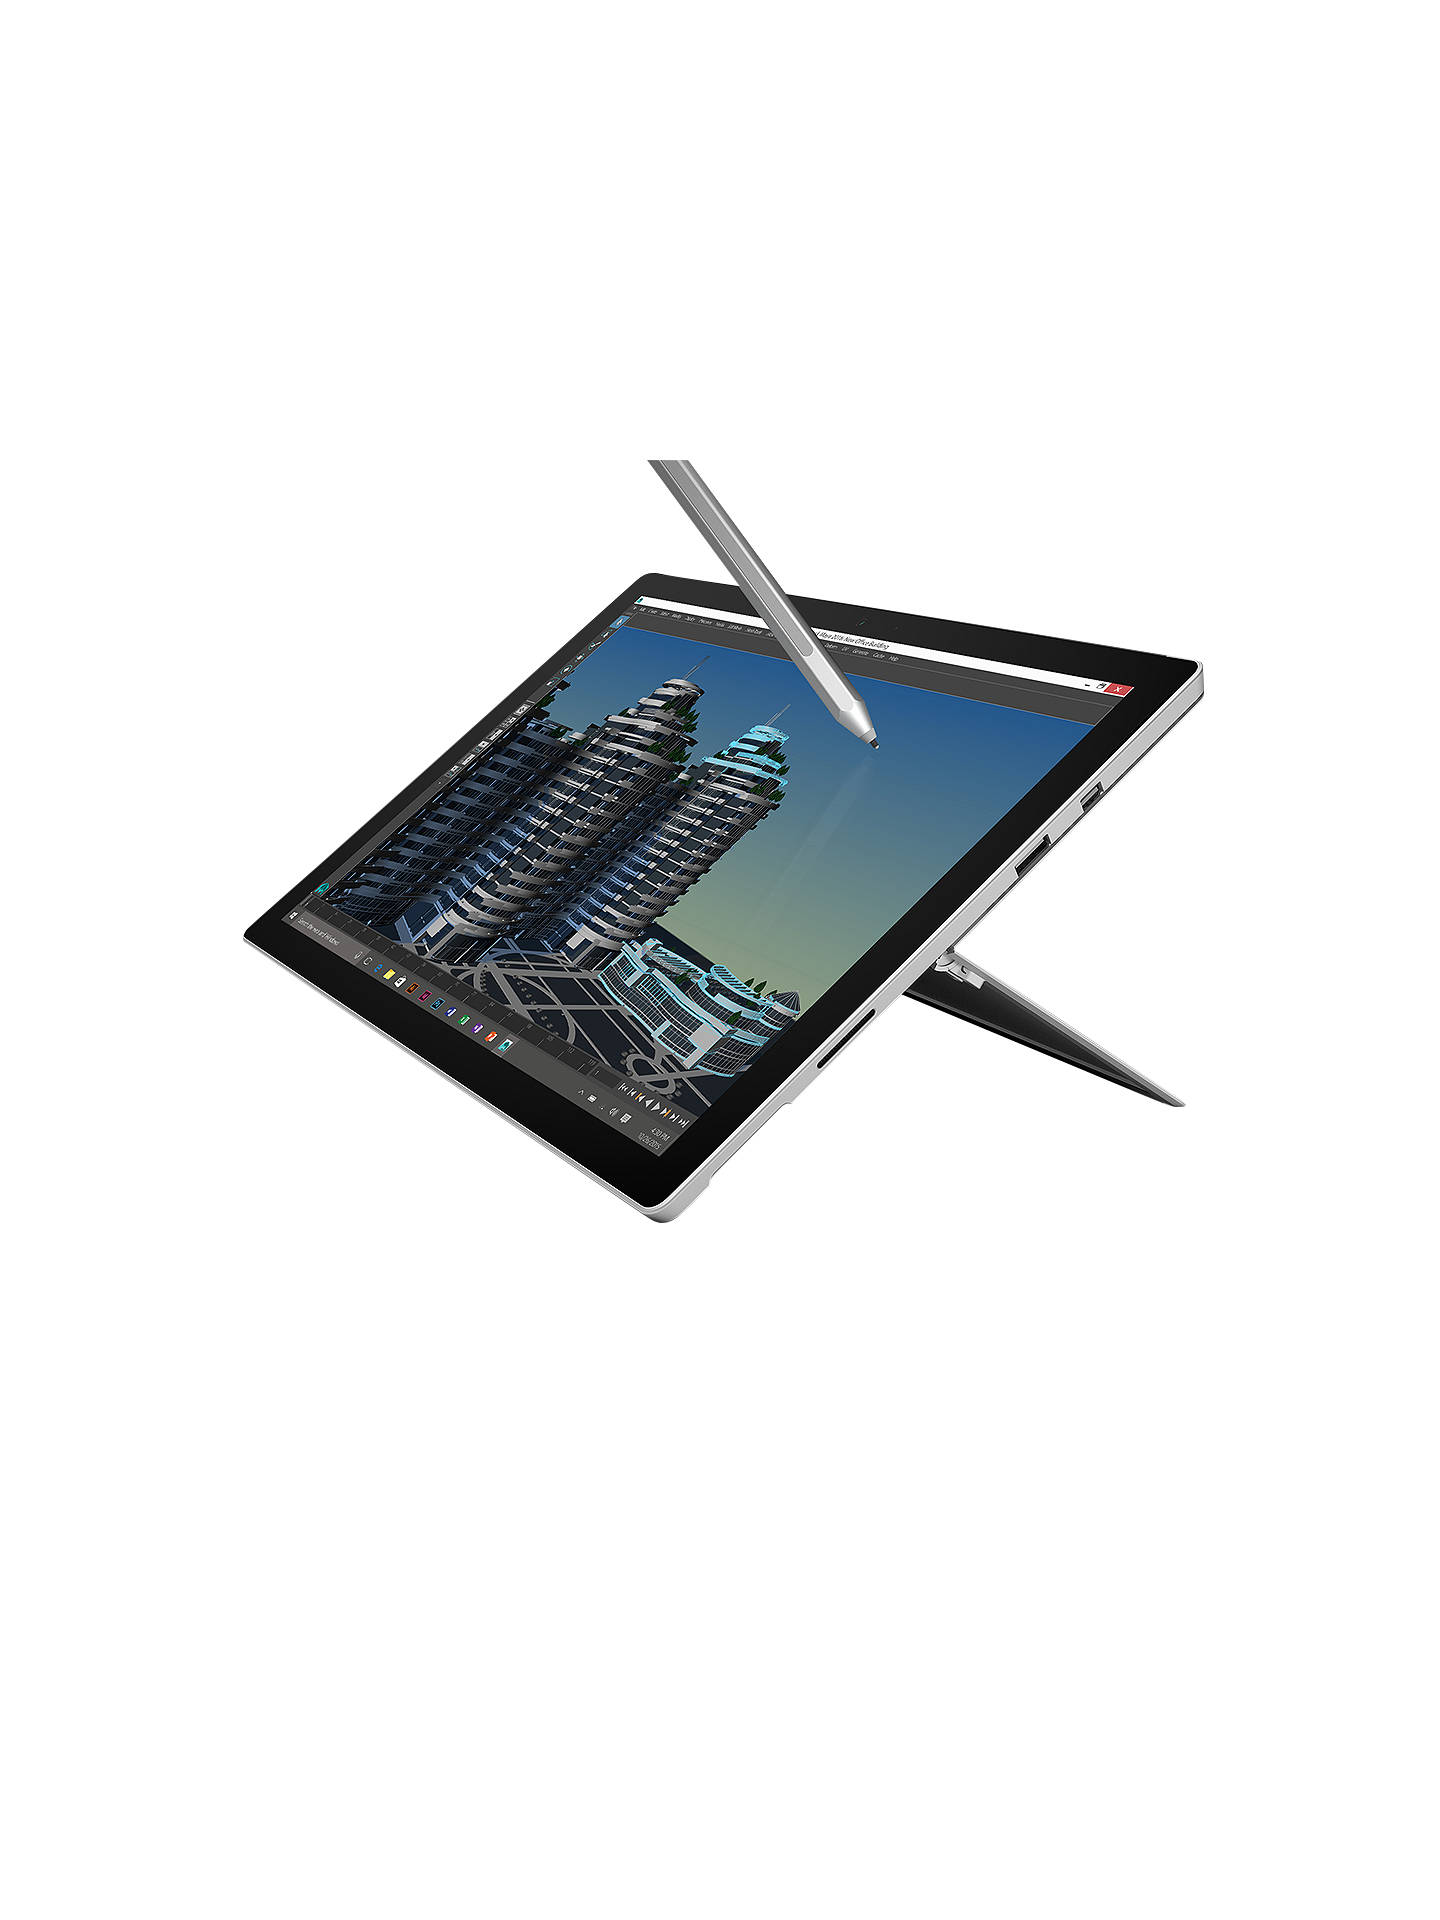 Microsoft Surface Pro 4 Tablet, Intel Core m3, 4GB RAM, 128GB SSD, 12 3